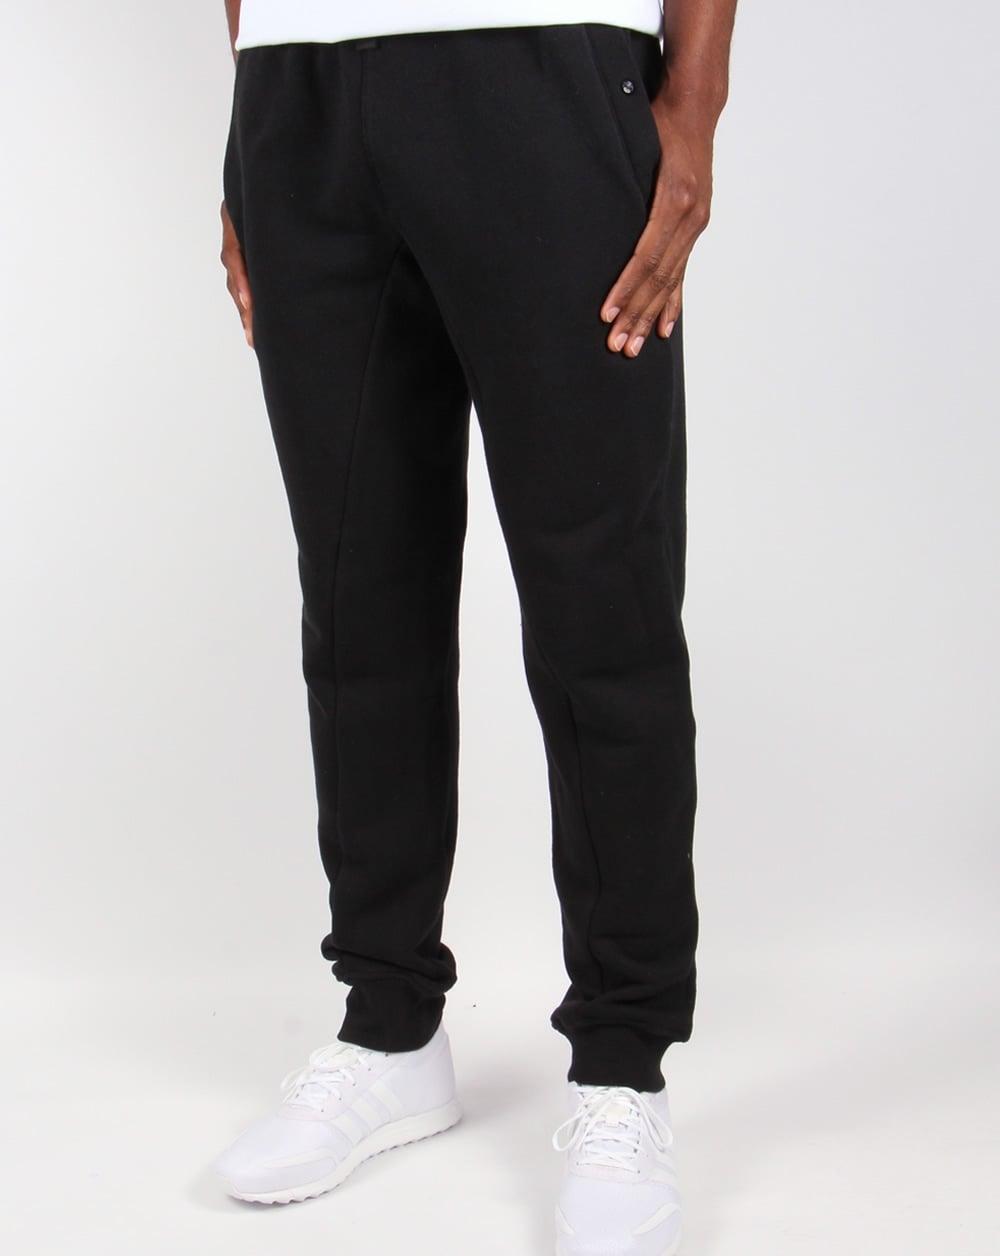 f02fc063c2 Ma.strum Slim Fit Herringbone Sweat Pants Black,tracksuit, bottoms,mens